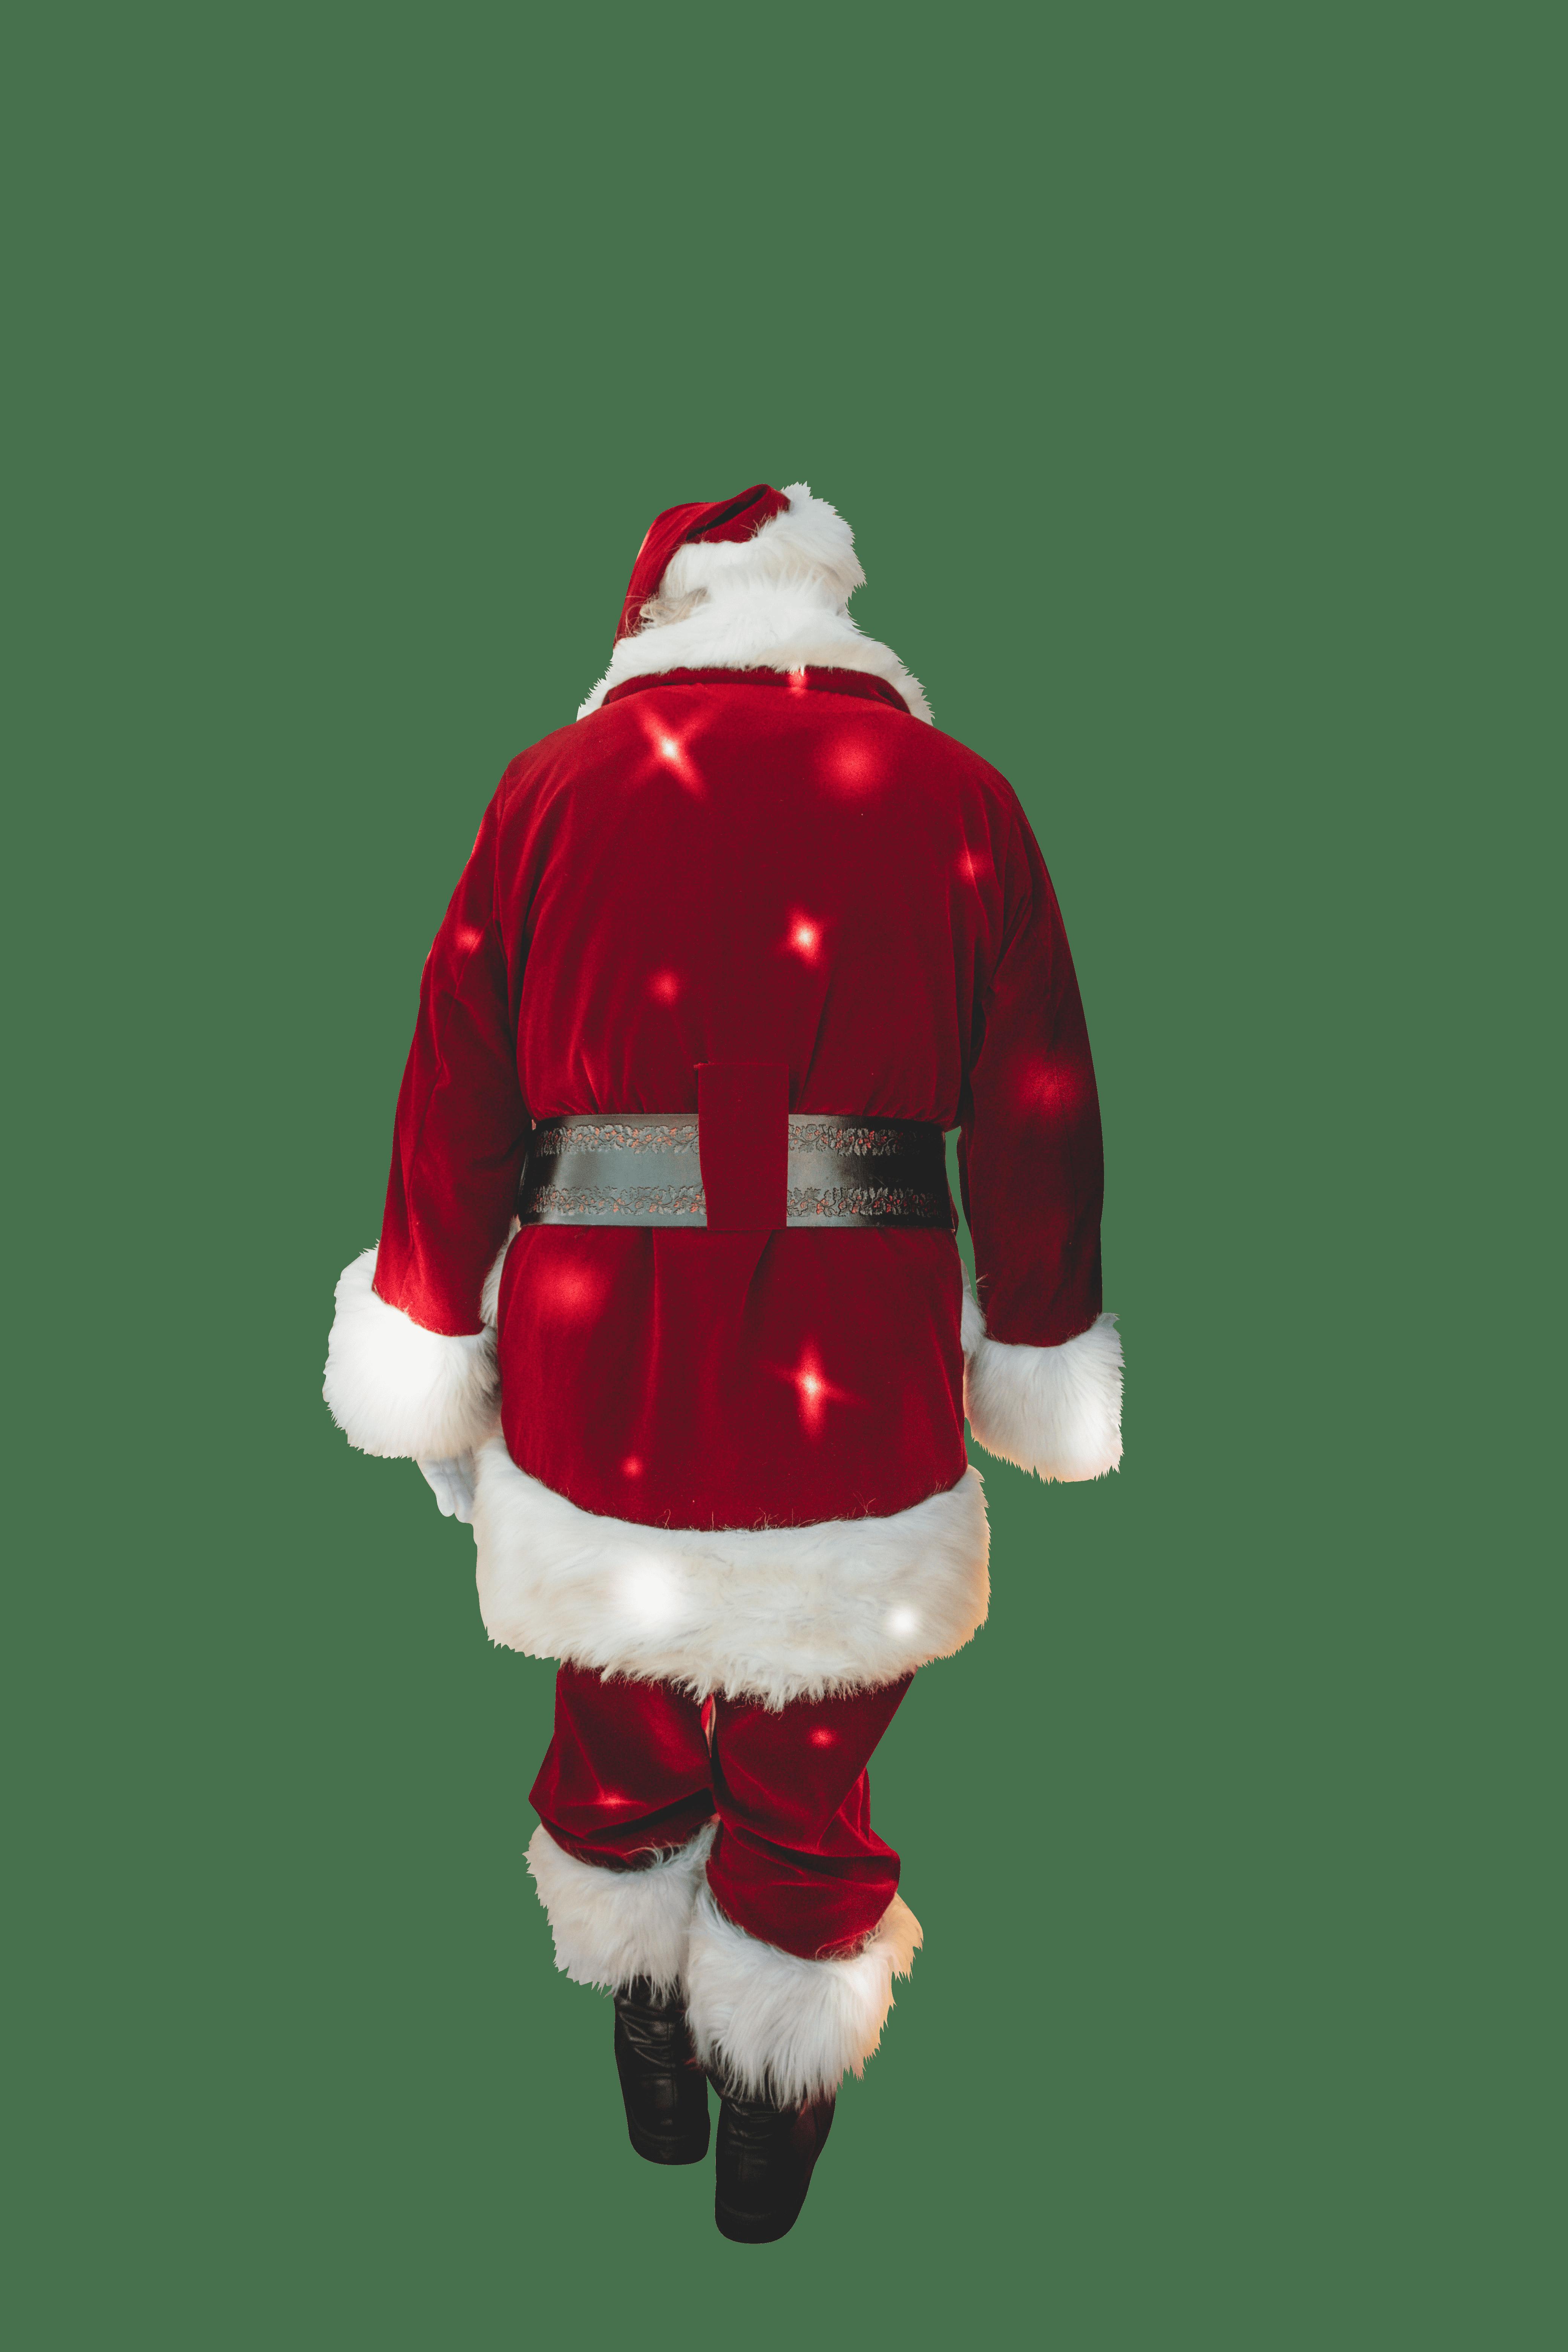 Santa Claus back view transparent background.png